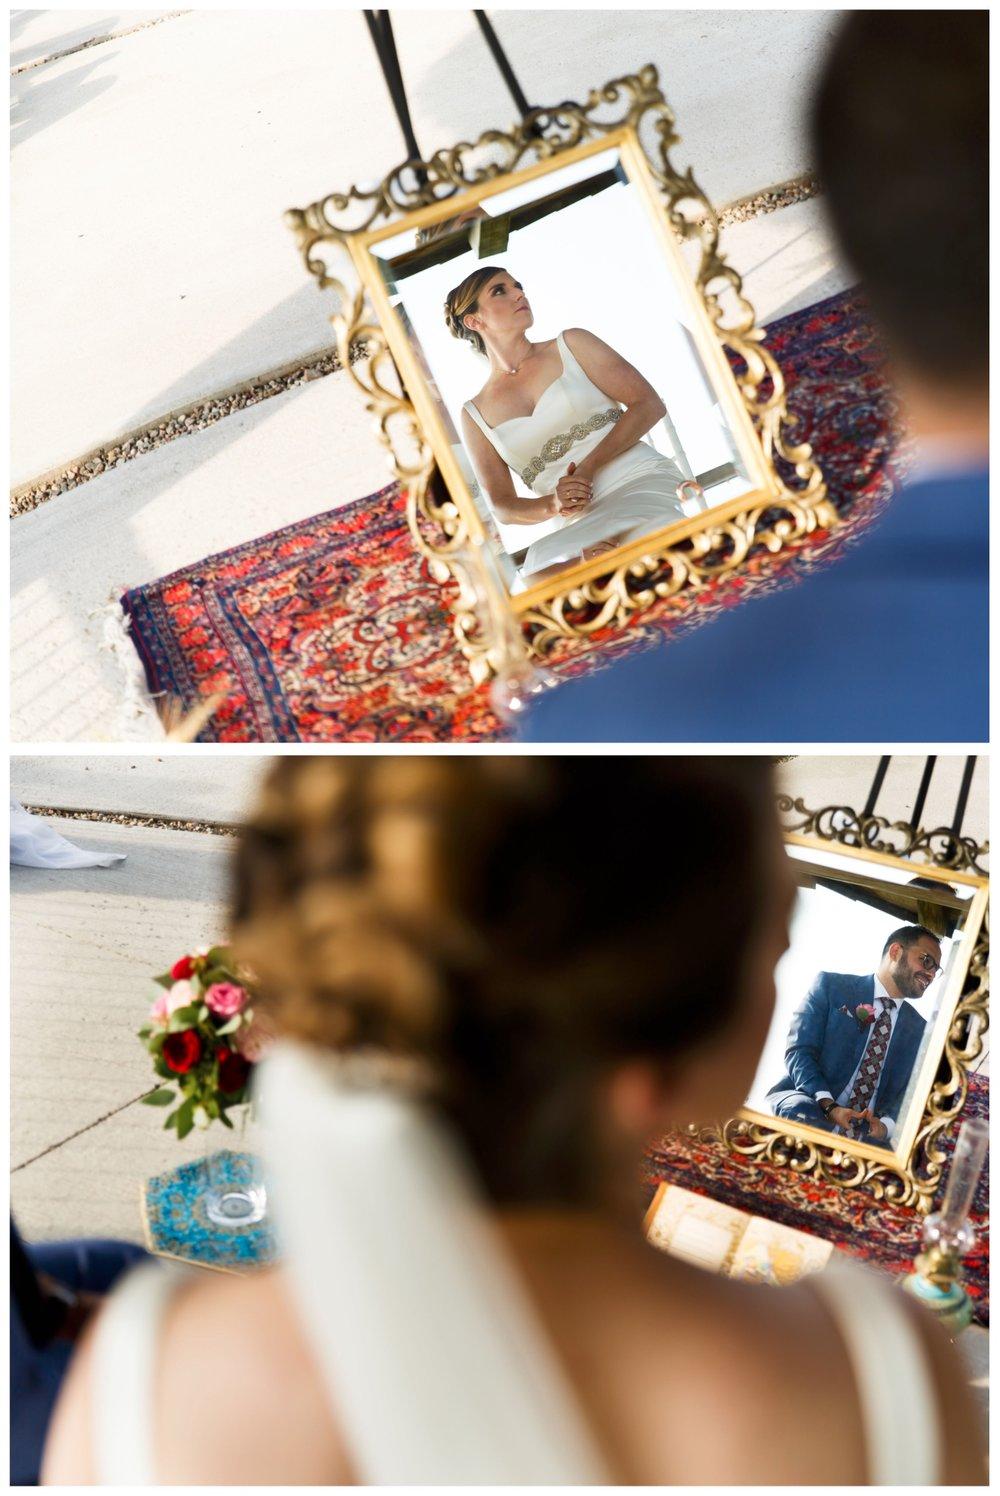 photos of a persian couple's reflection in a mirror